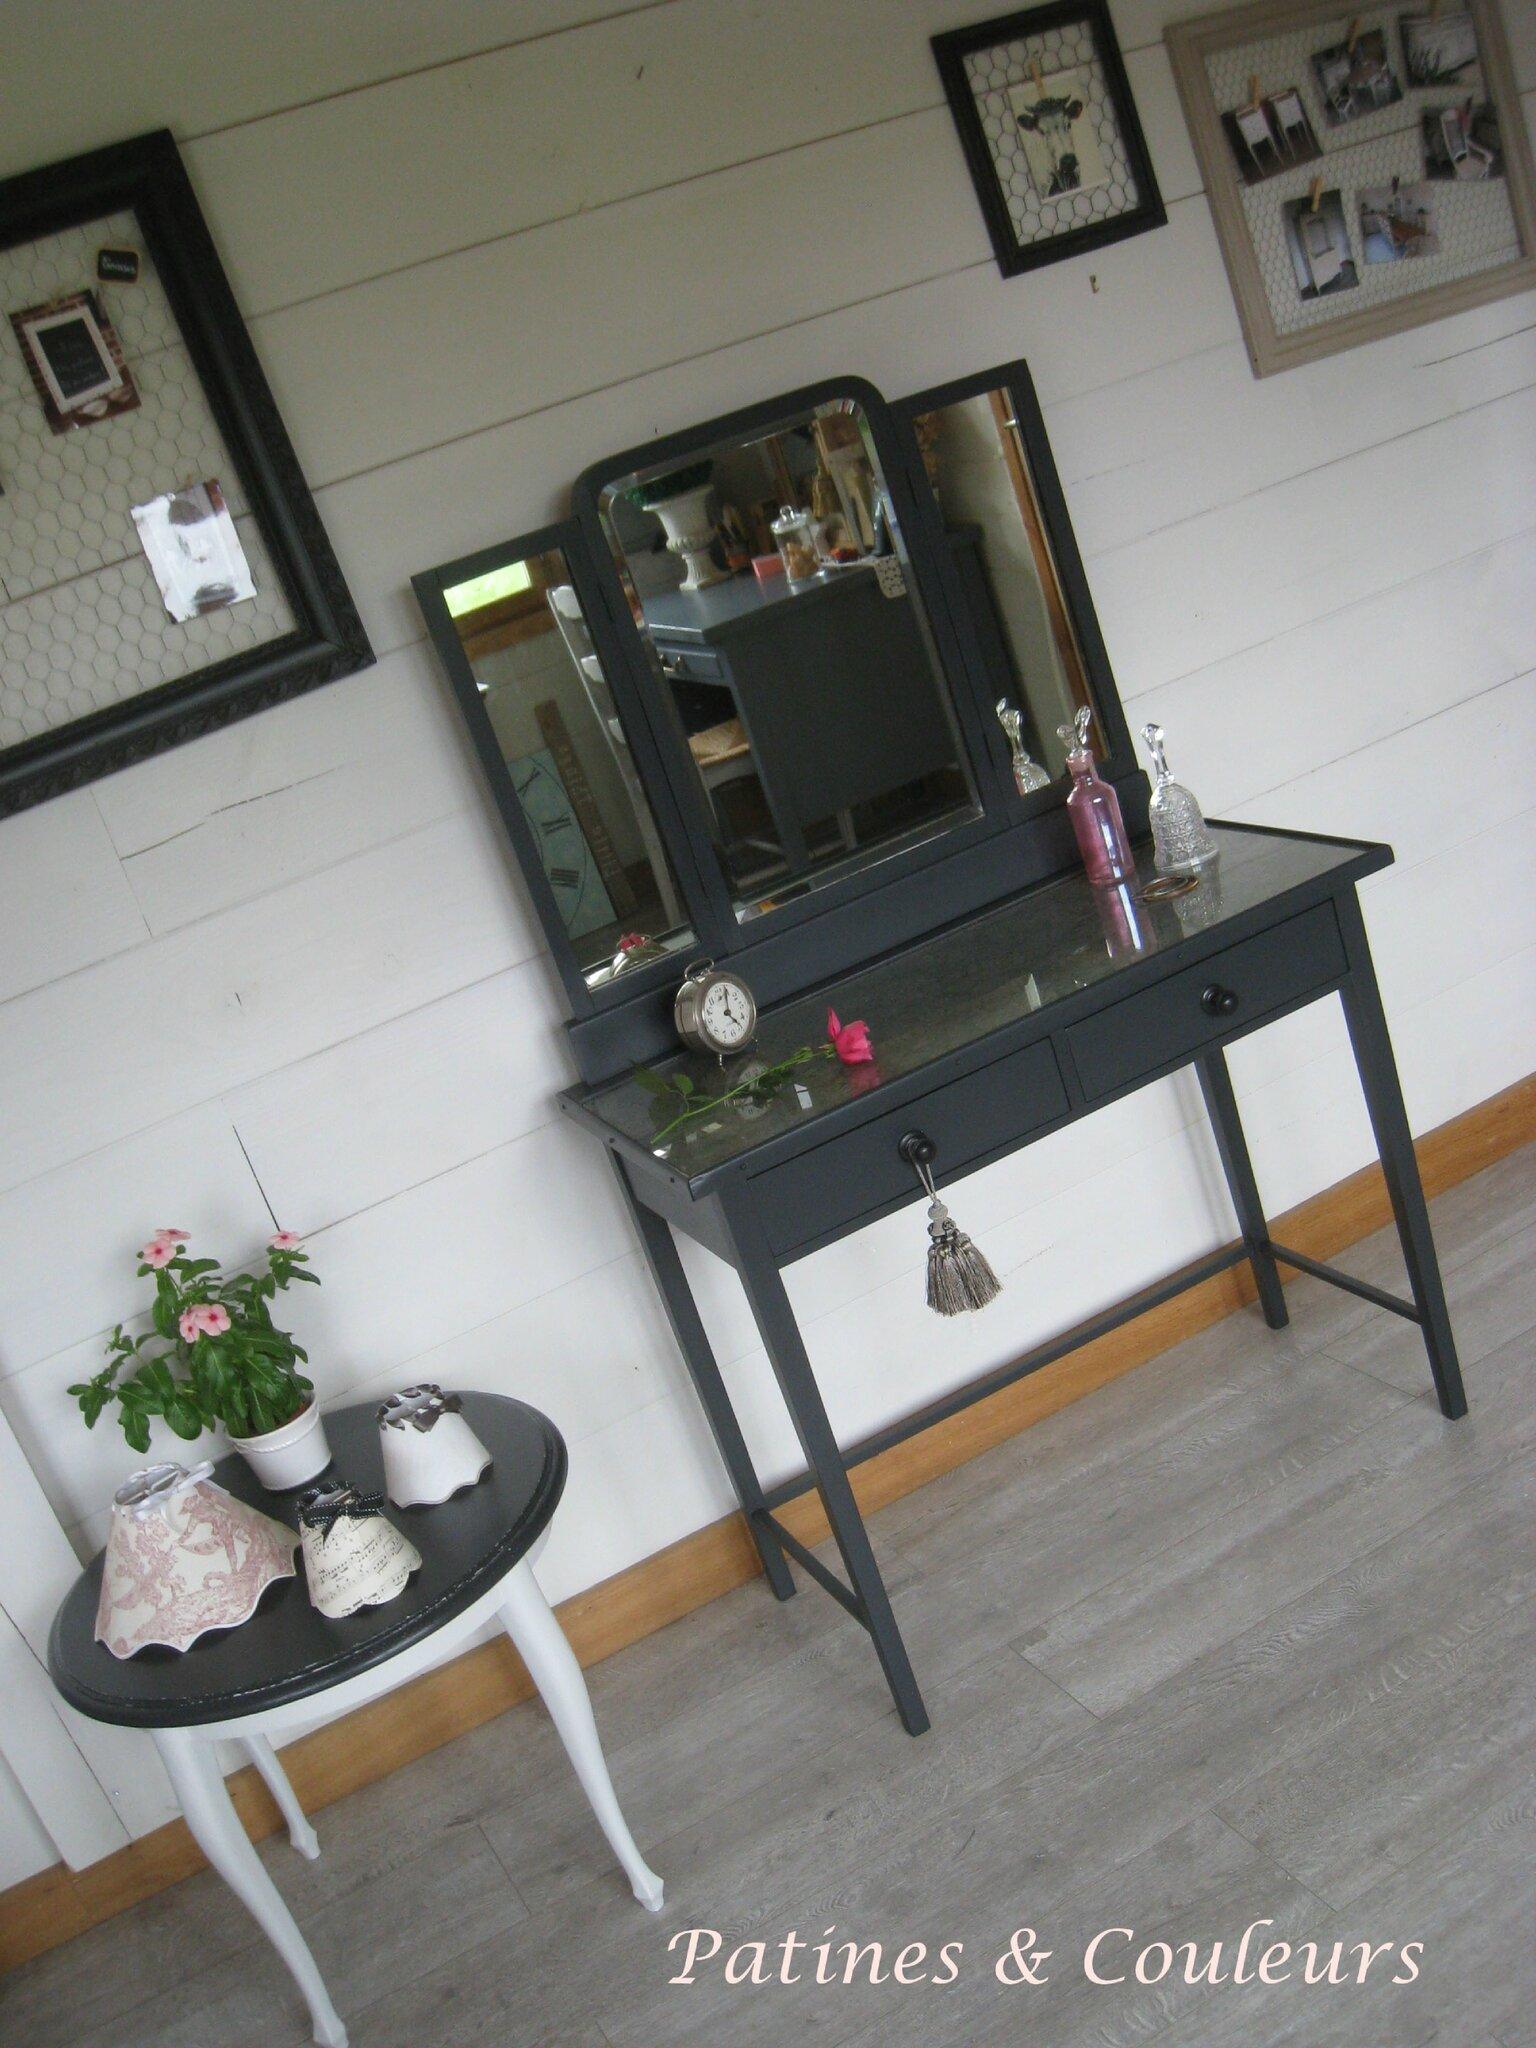 patines couleurs. Black Bedroom Furniture Sets. Home Design Ideas